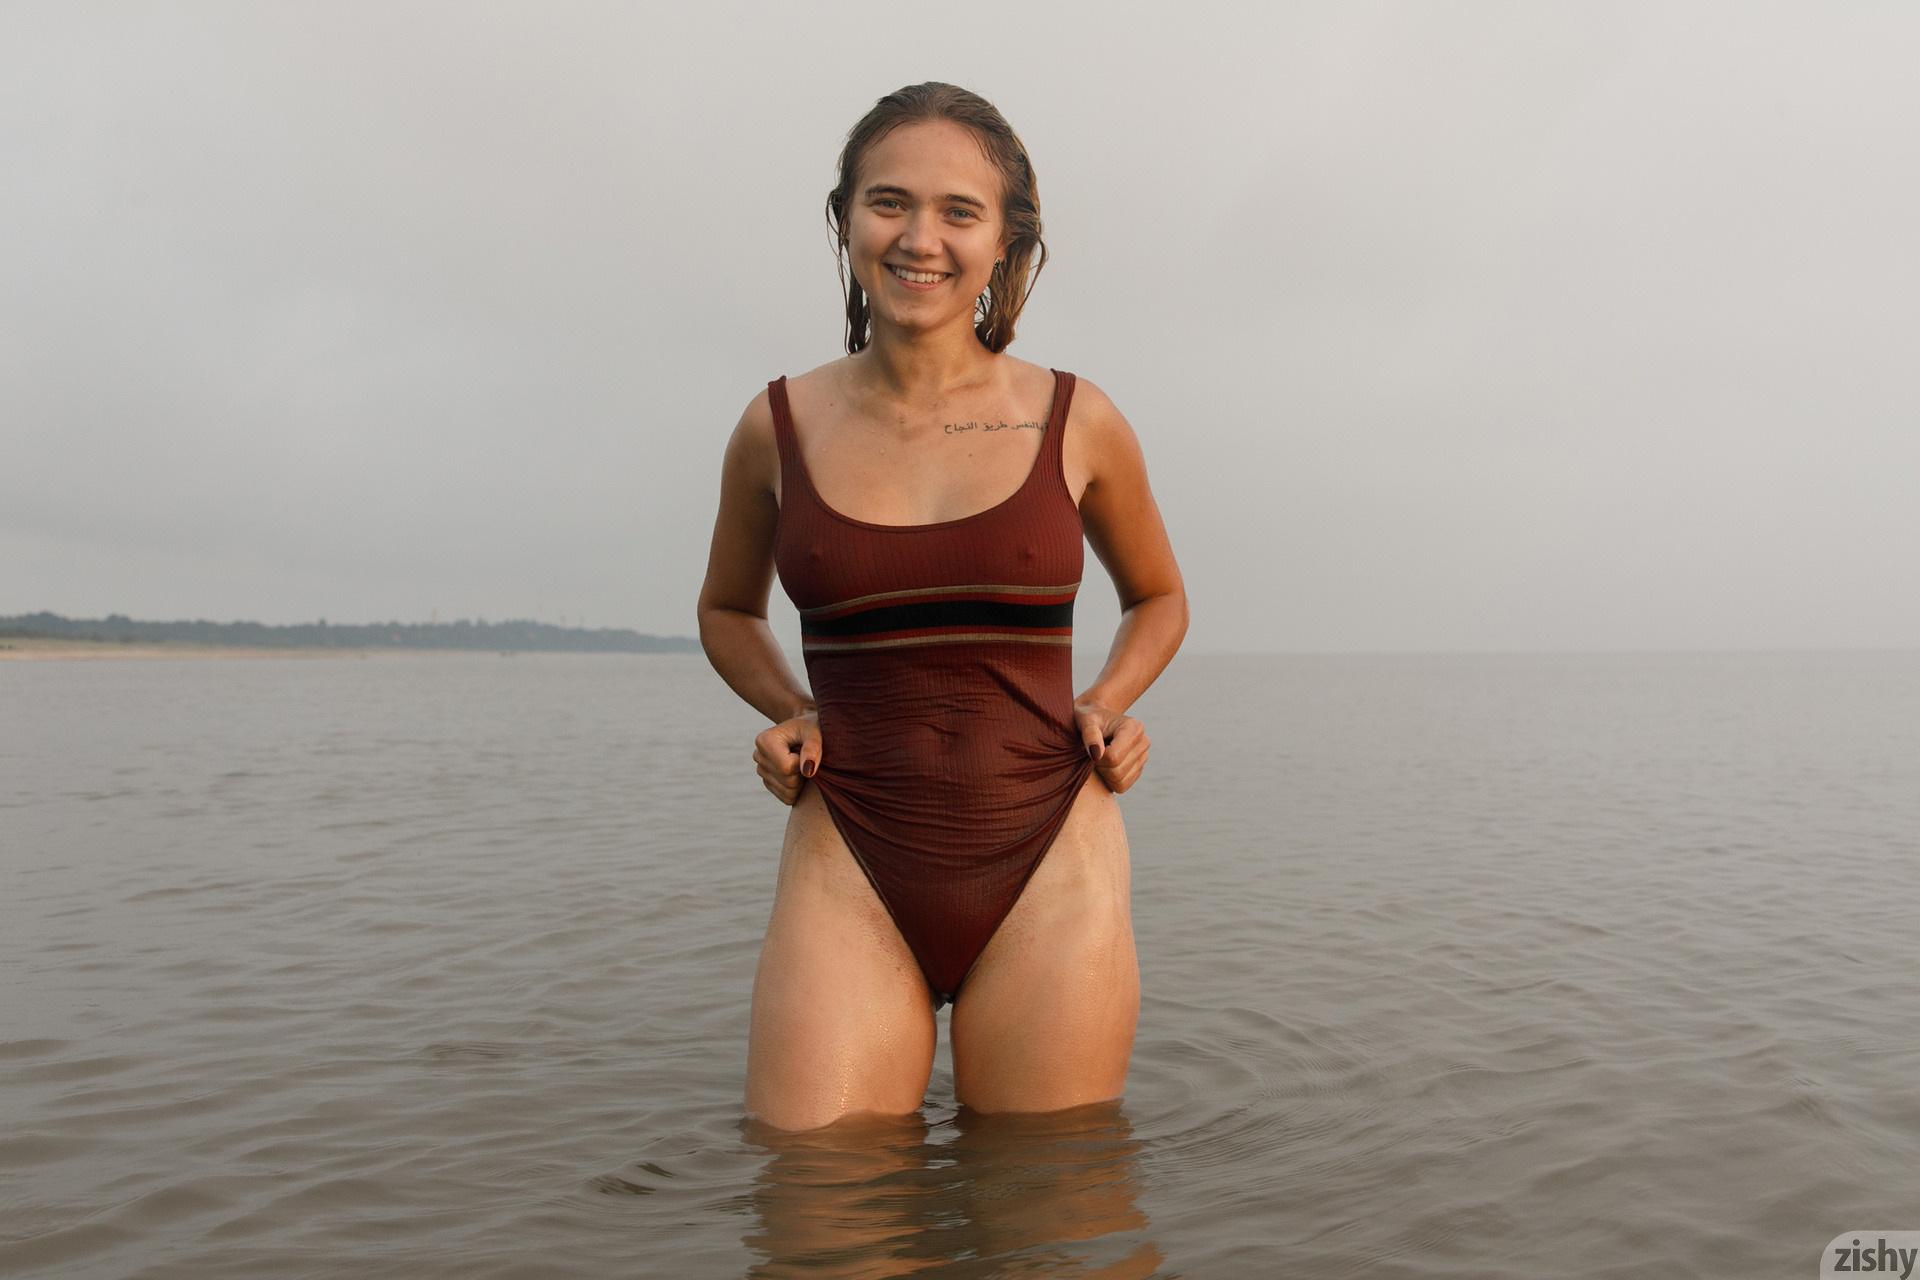 Sofia Orlova On Gryaznyy Beach Zishy (85)